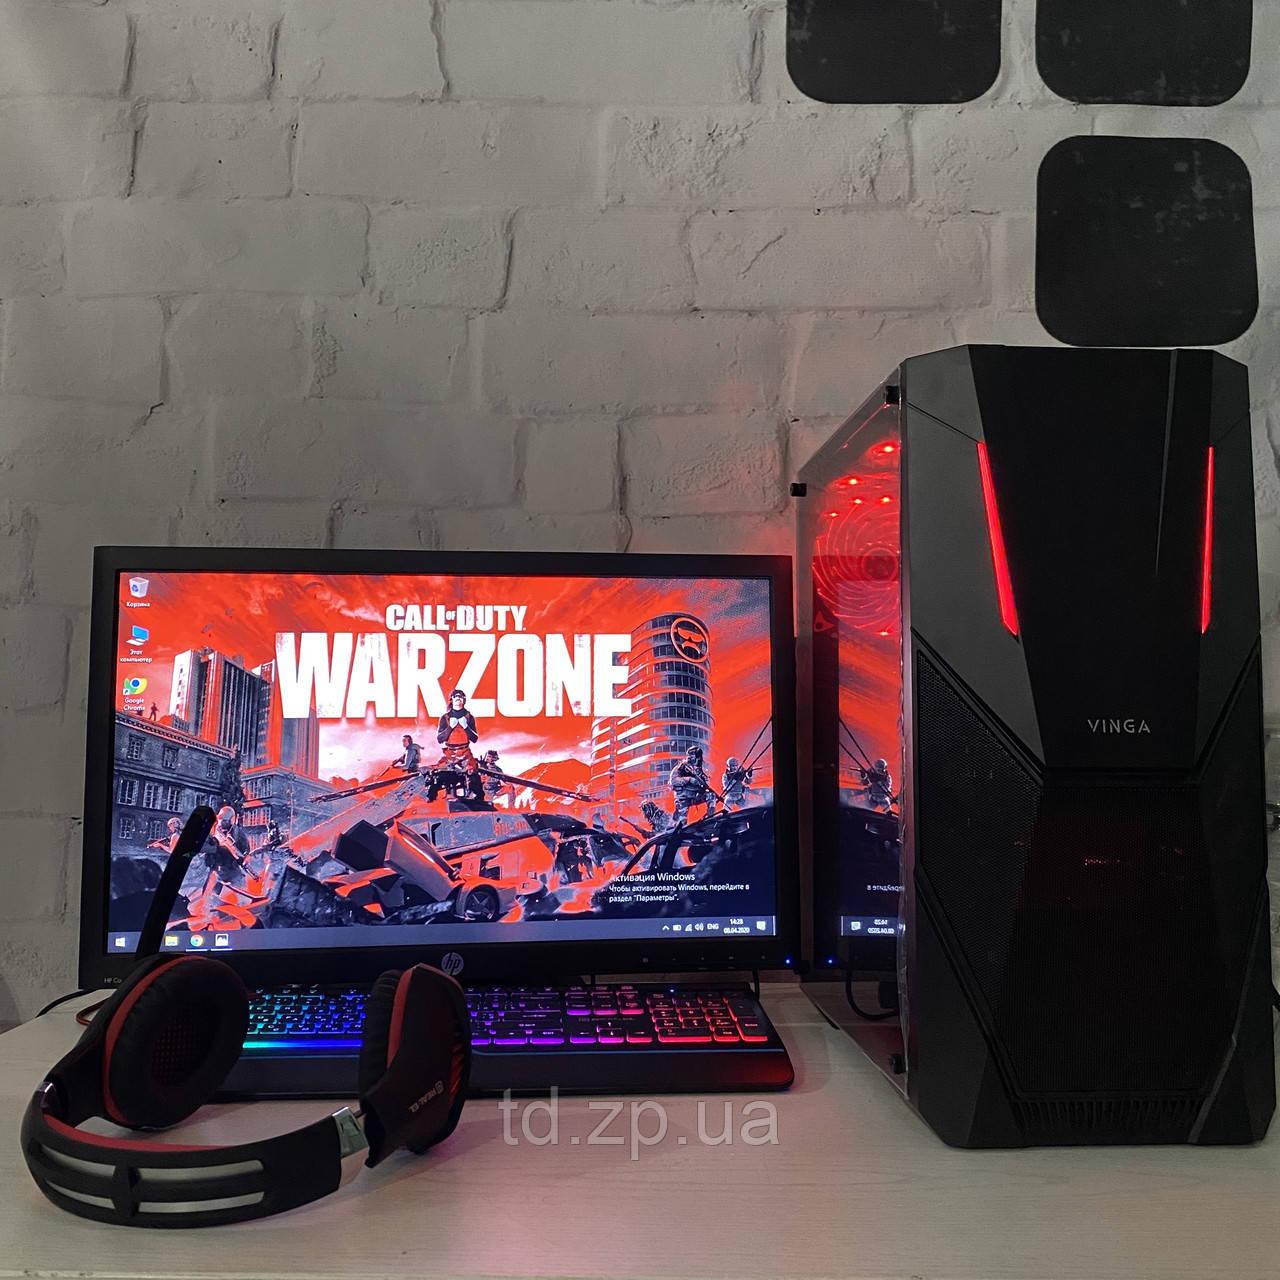 Игровой компьютер для стримов Intel core i7-2600 + GTX 1060 3Gb + RAM 8Gb + hdd 500gb